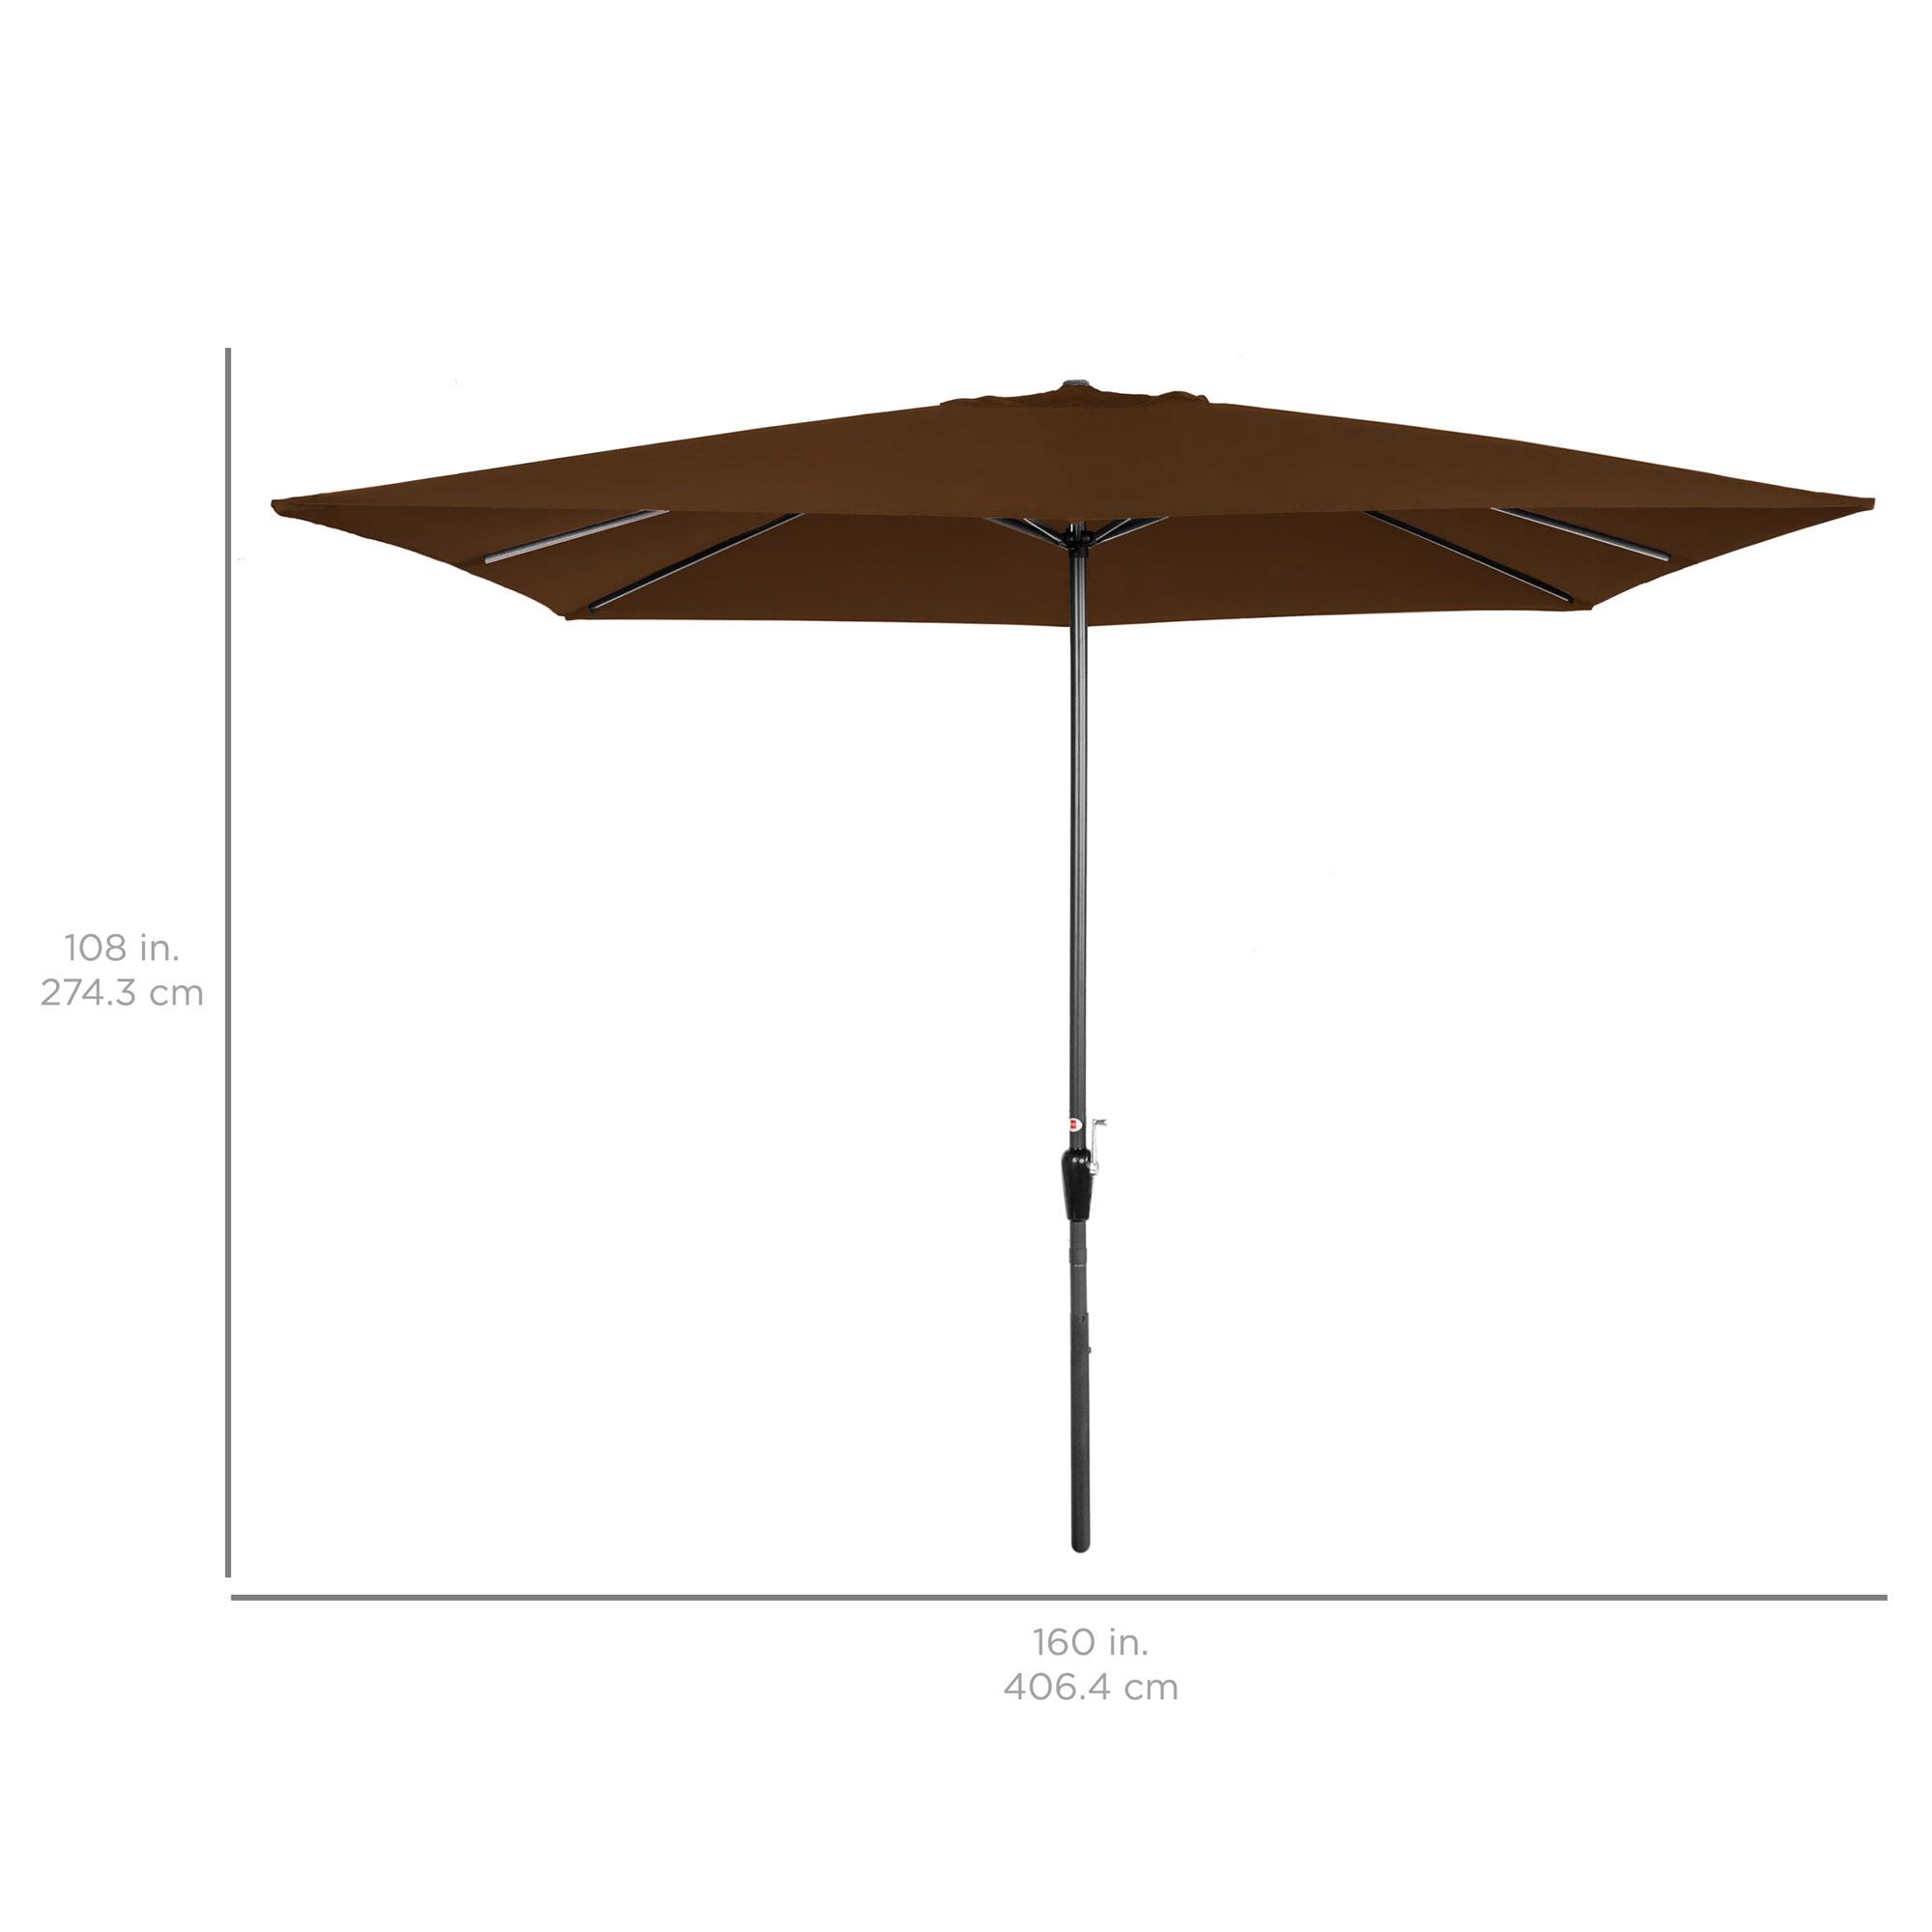 BCP-8x11ft-Rectangular-Patio-Umbrella-w-Easy-Crank-UV-Resistant-Fabric thumbnail 14